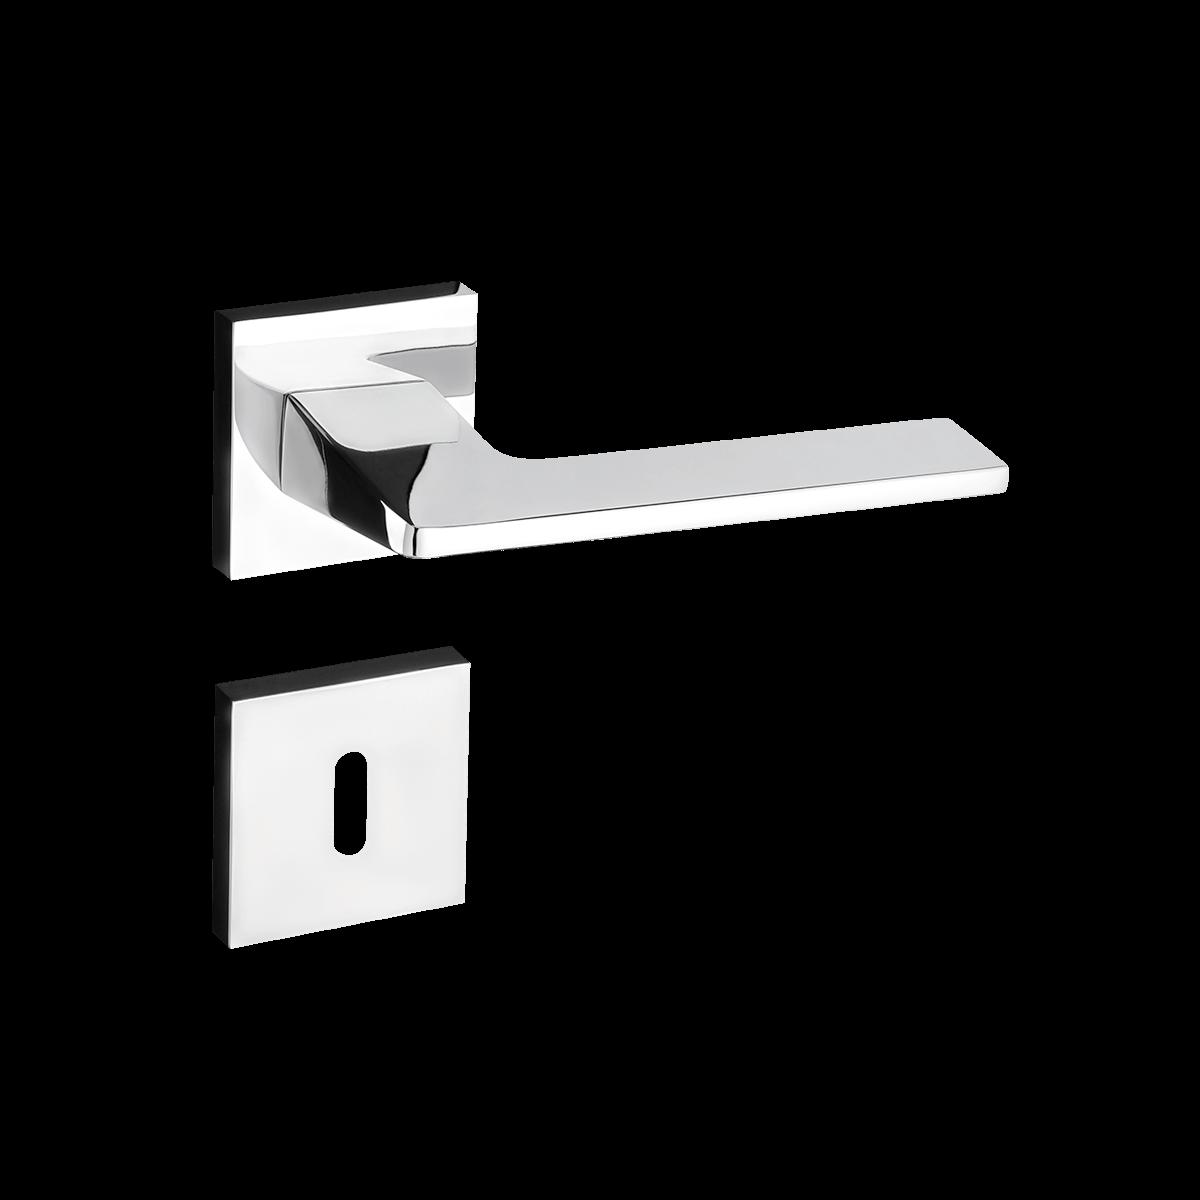 Kit fechadura pado sara 03 interna 03 banheiro